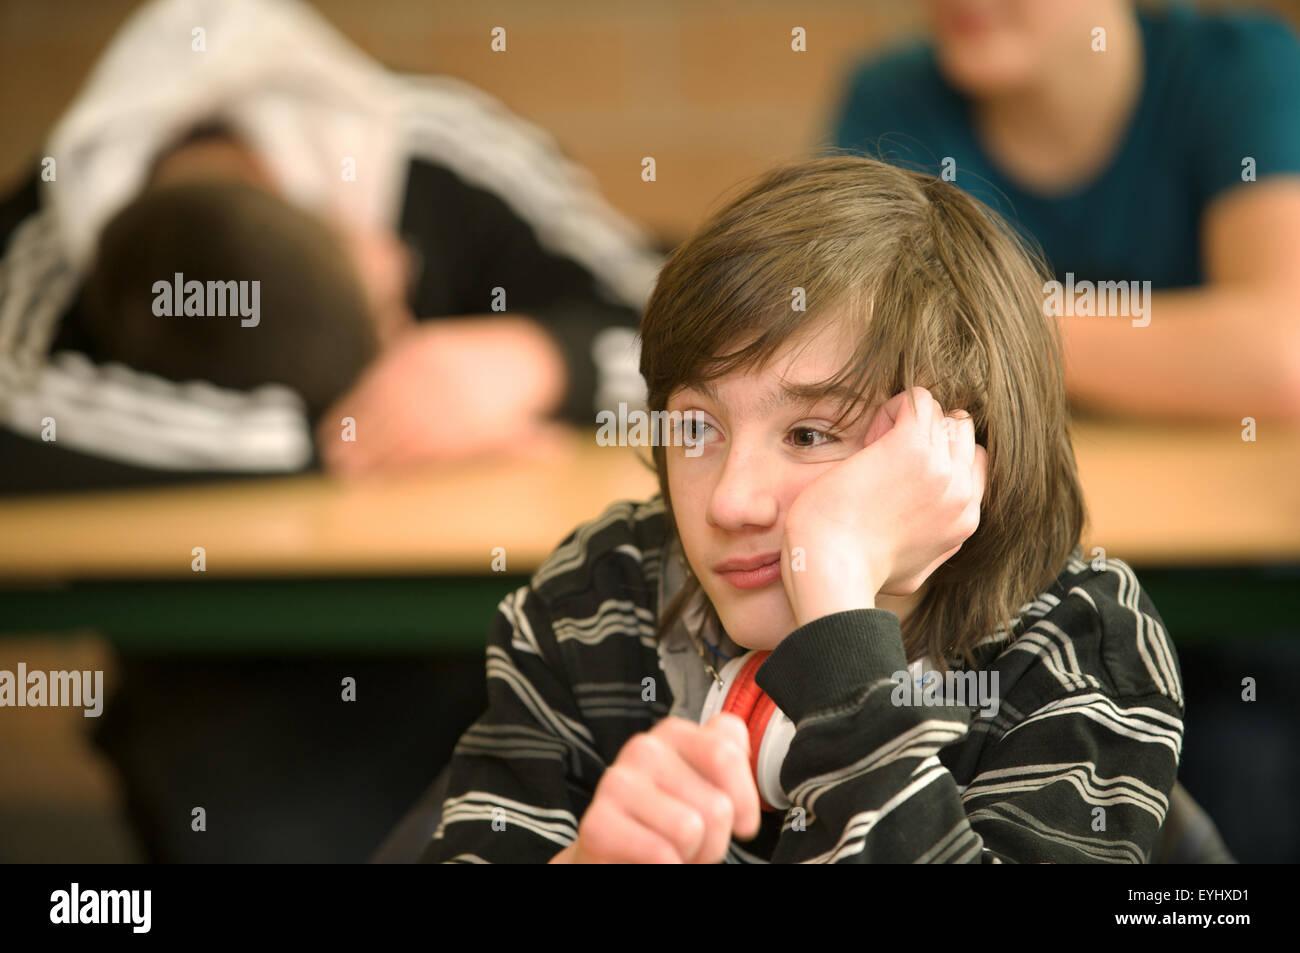 Board schoolboys in class - Stock Image